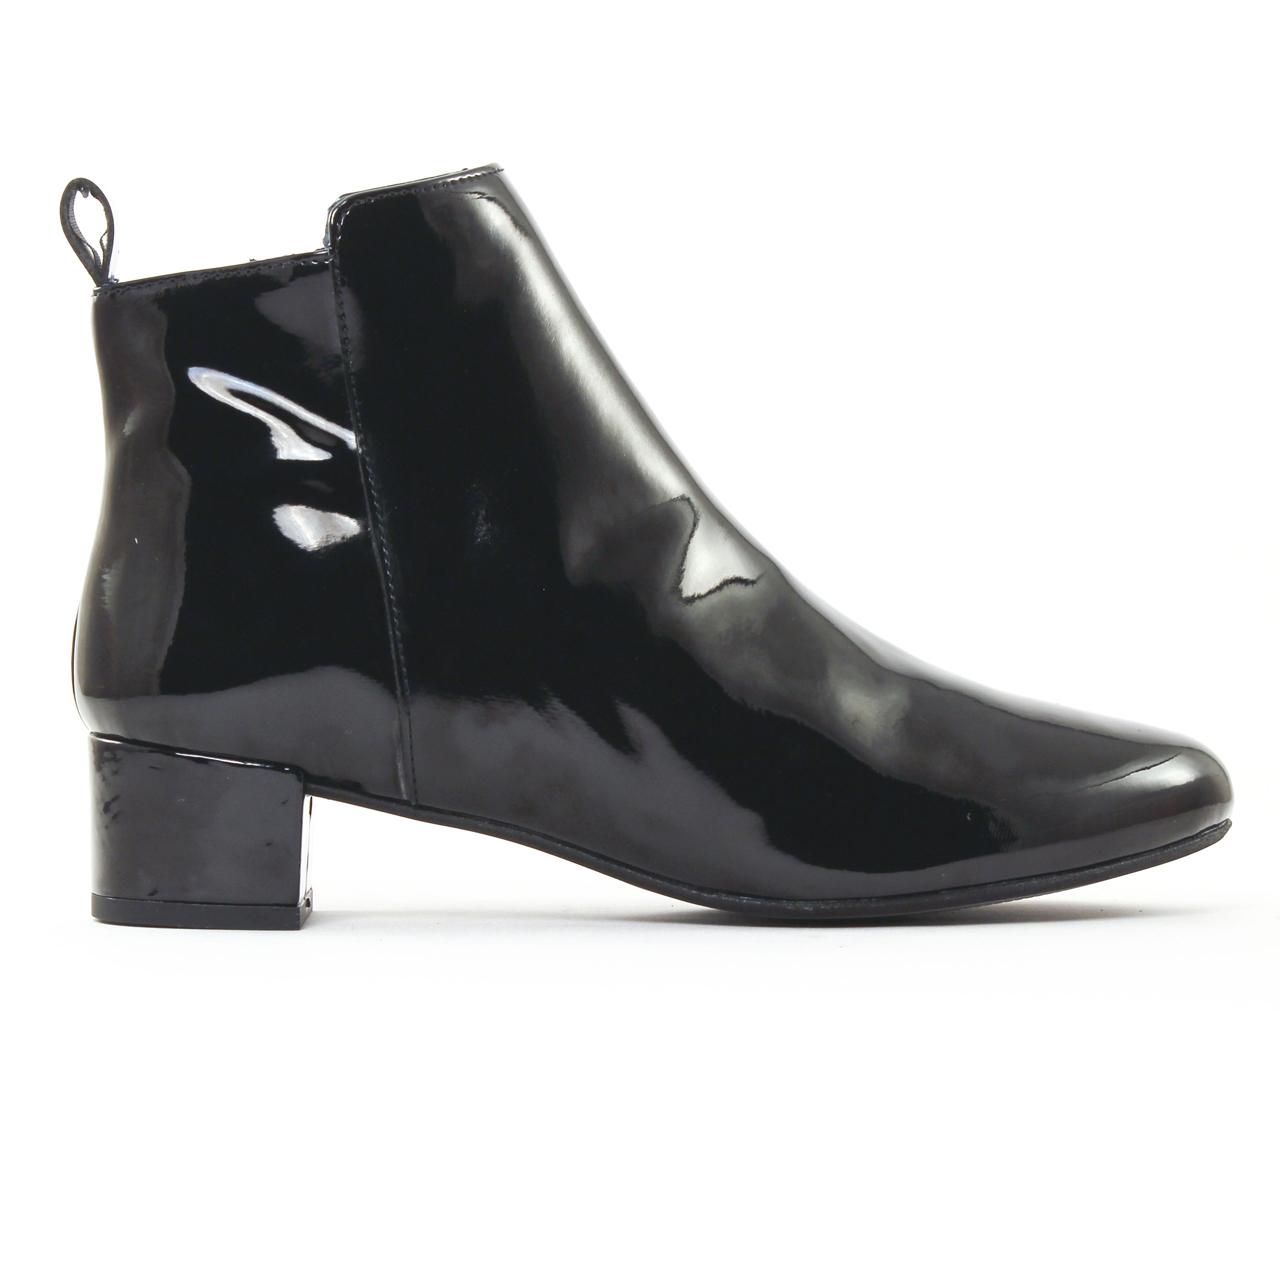 scarlatine 3056a vernis noir boots noir automne hiver. Black Bedroom Furniture Sets. Home Design Ideas